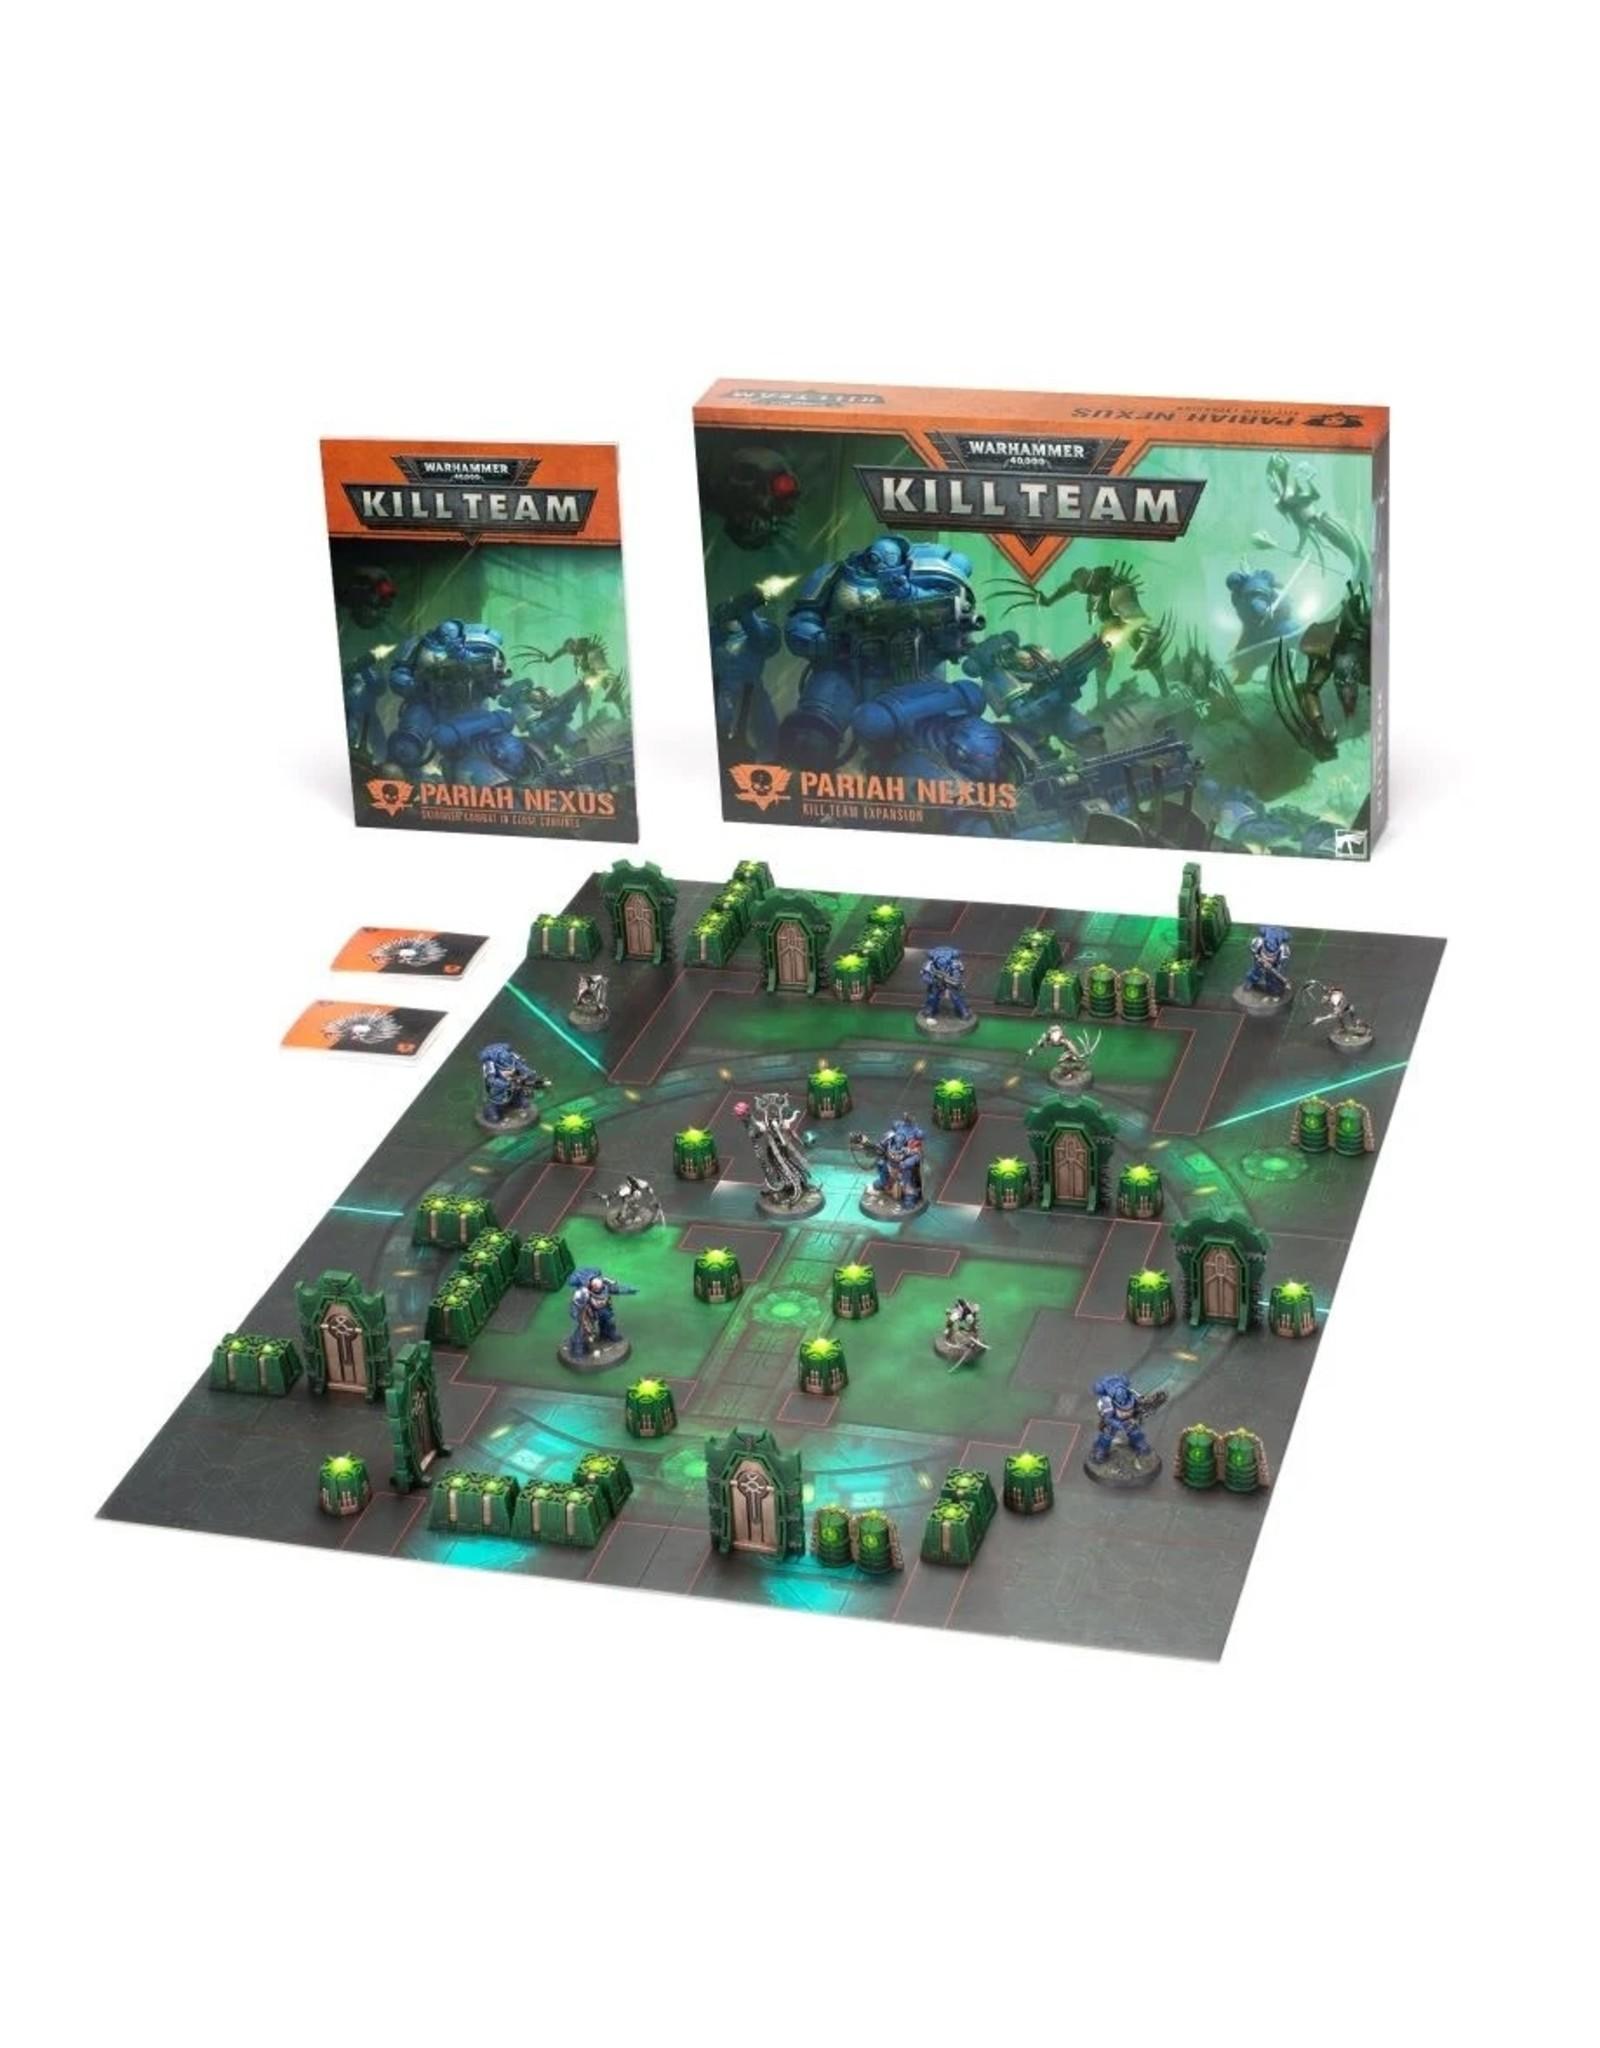 Games Workshop WH40K Kill Team: Pariah Nexus